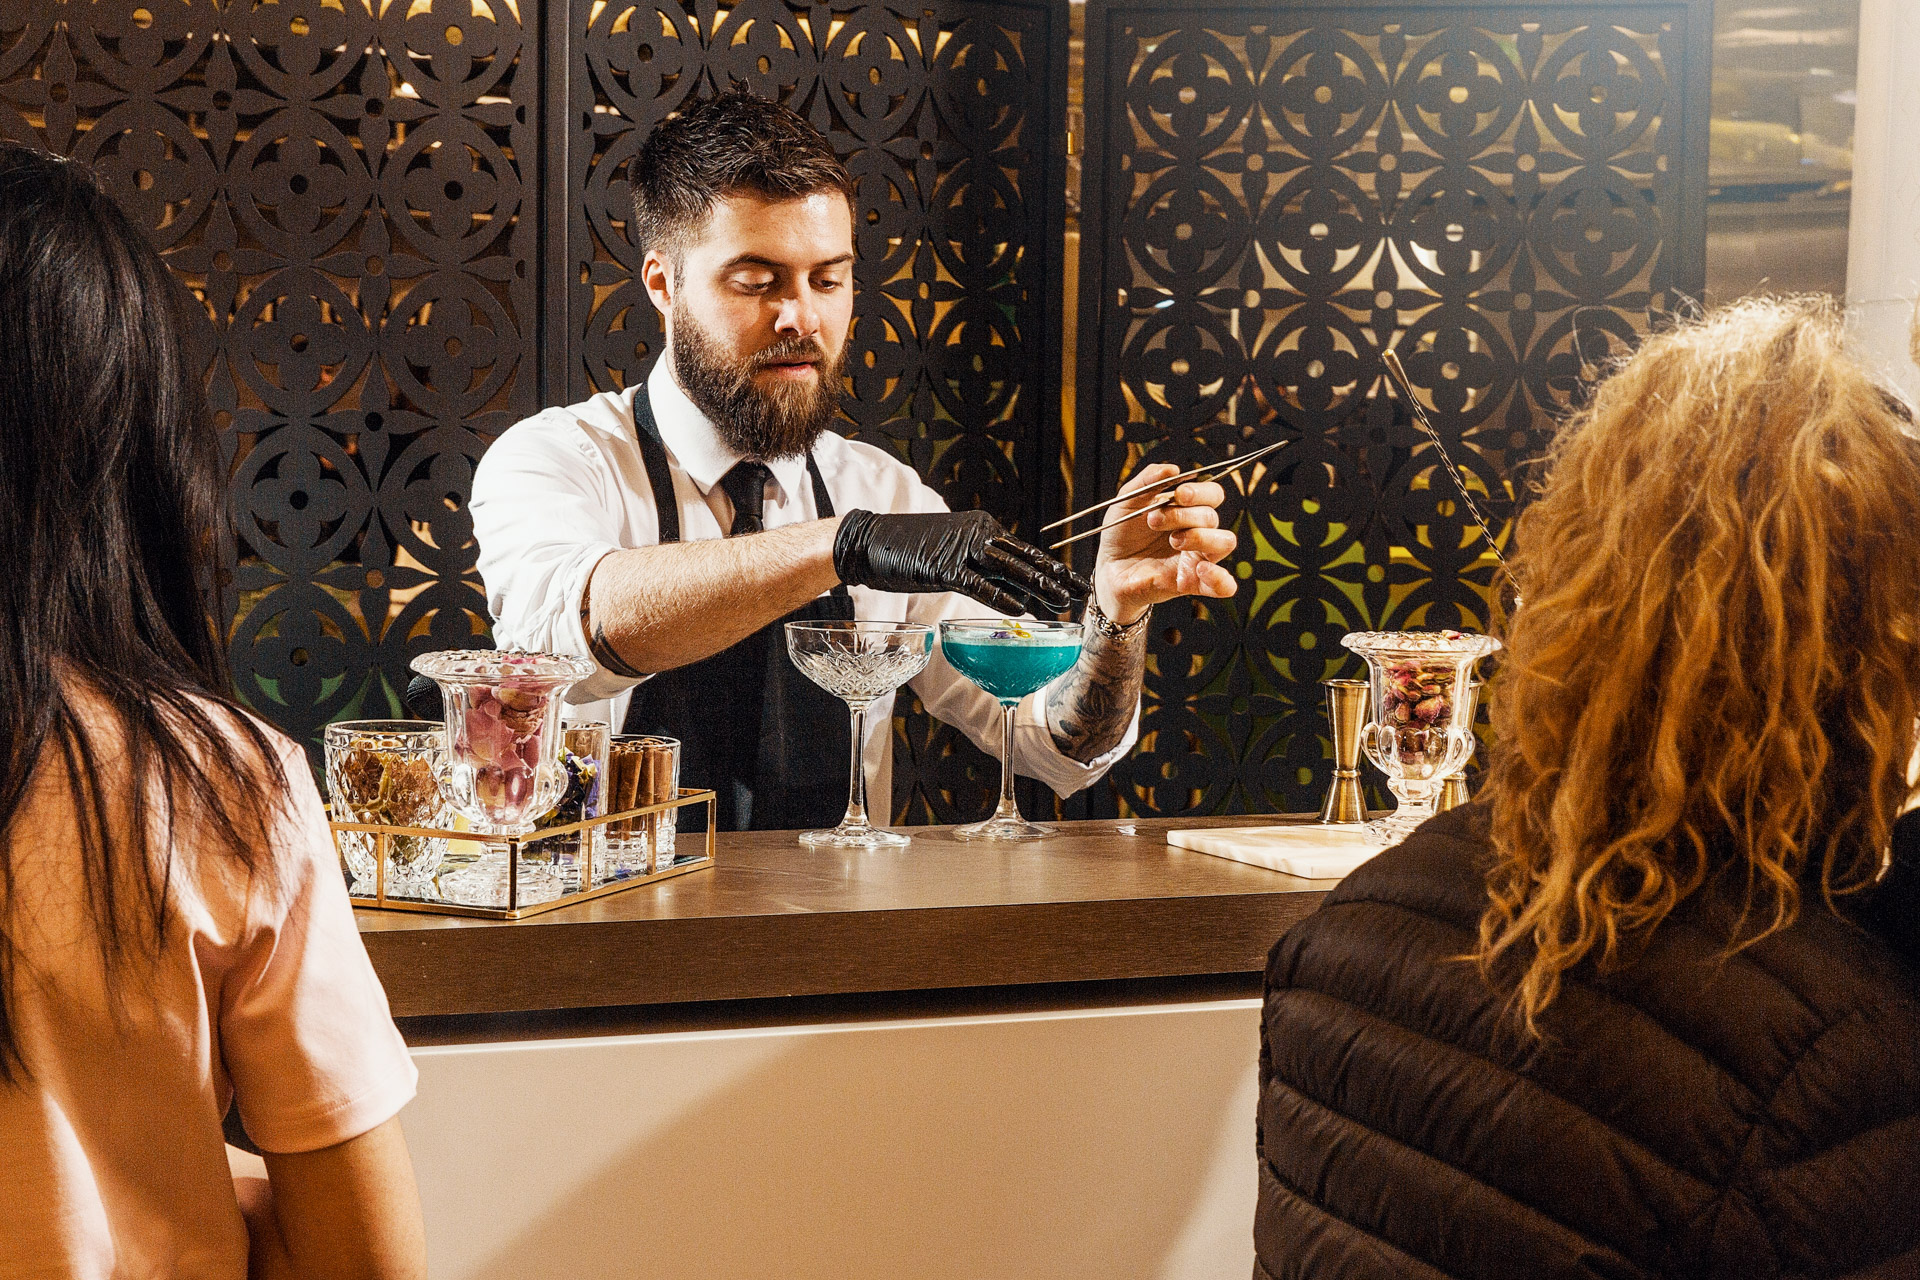 nouvelle collection parfums · galeries lafayette